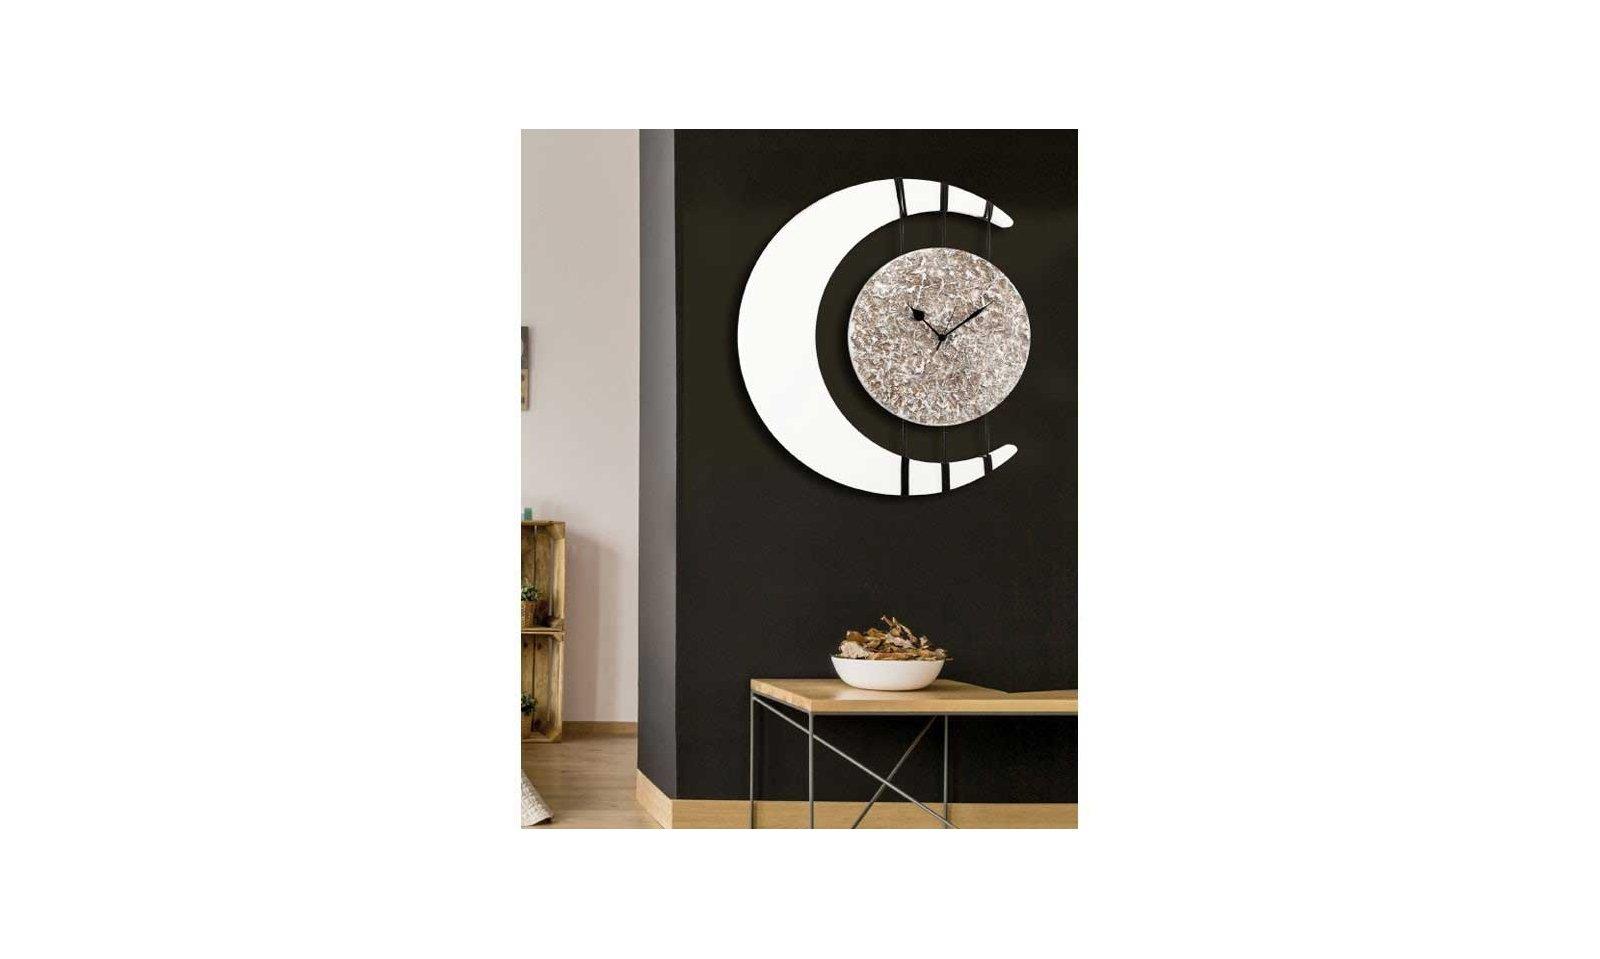 Orologi Da Parete In Tela : Pintdecor orologio da parete eclissi orologio da parete moderno